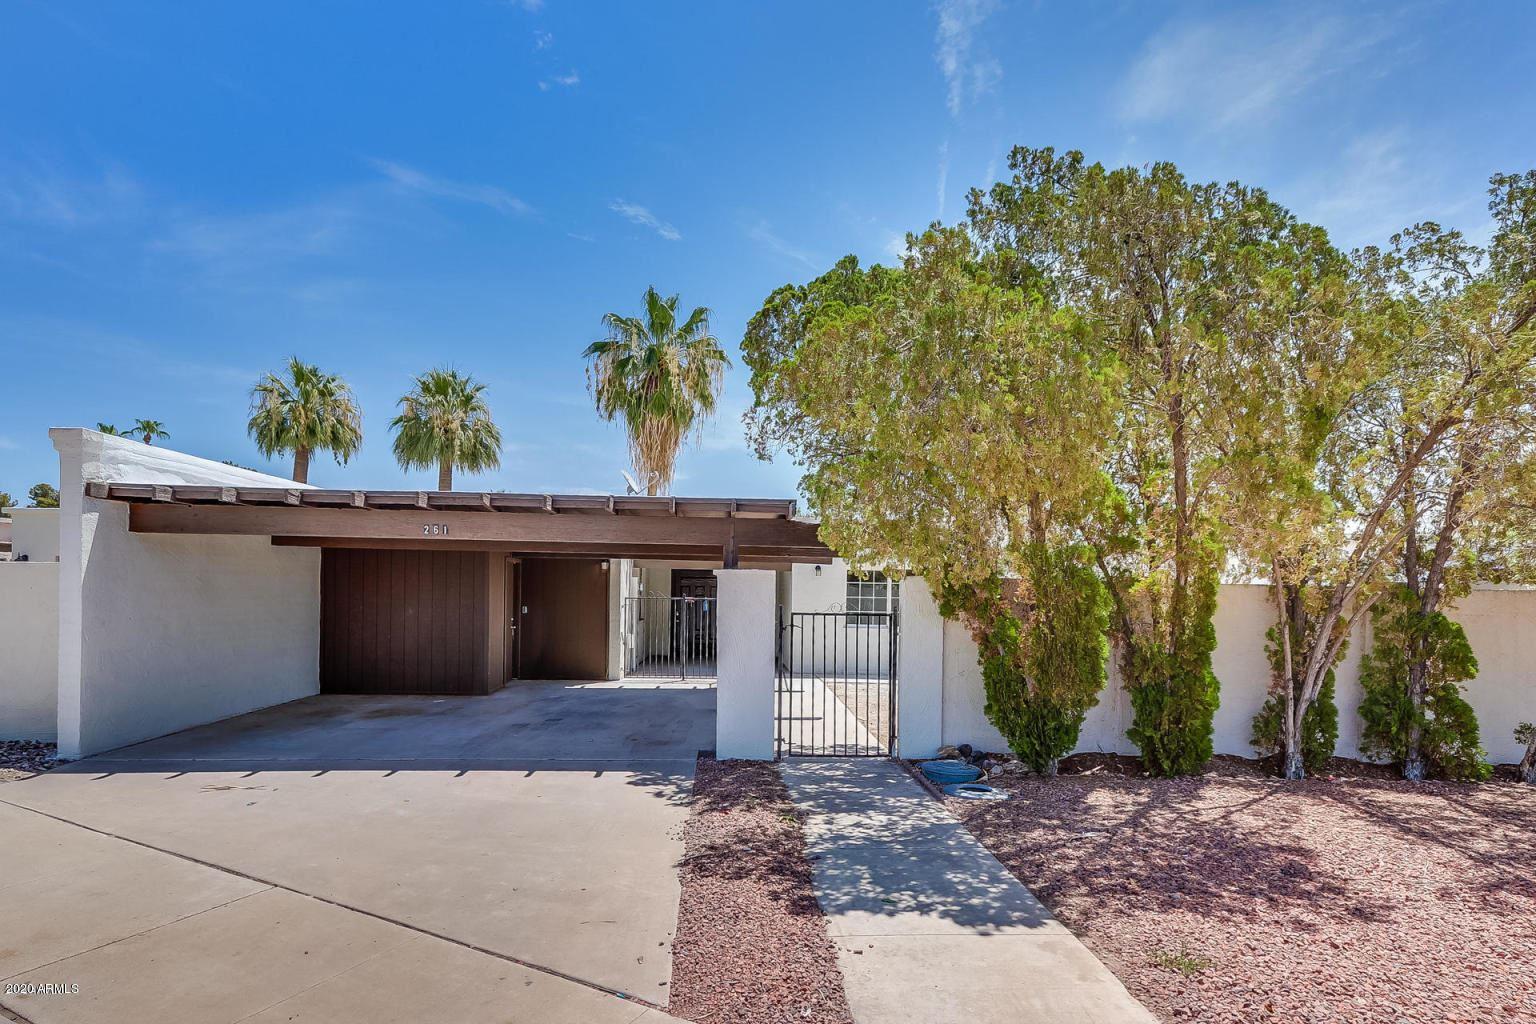 261 S OLD LITCHFIELD Road, Litchfield Park, AZ 85340 - MLS#: 6113041